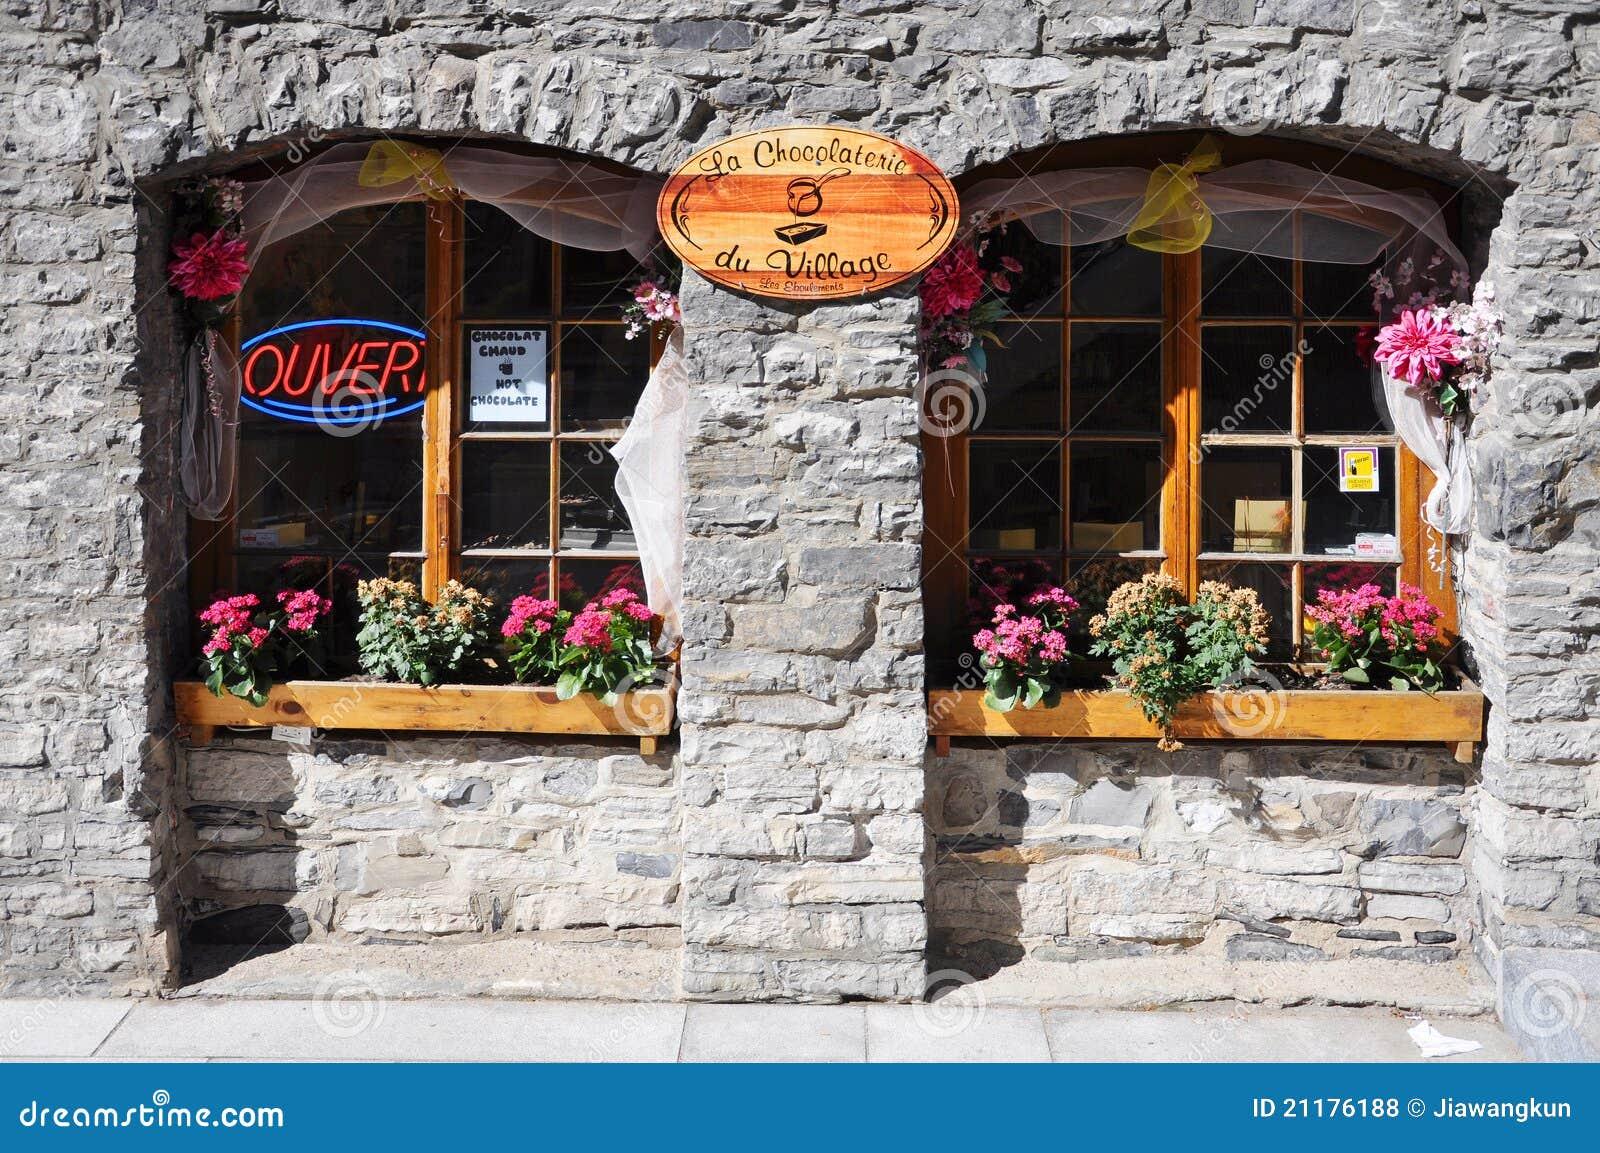 La Chocolaterie du Village in Quebec City